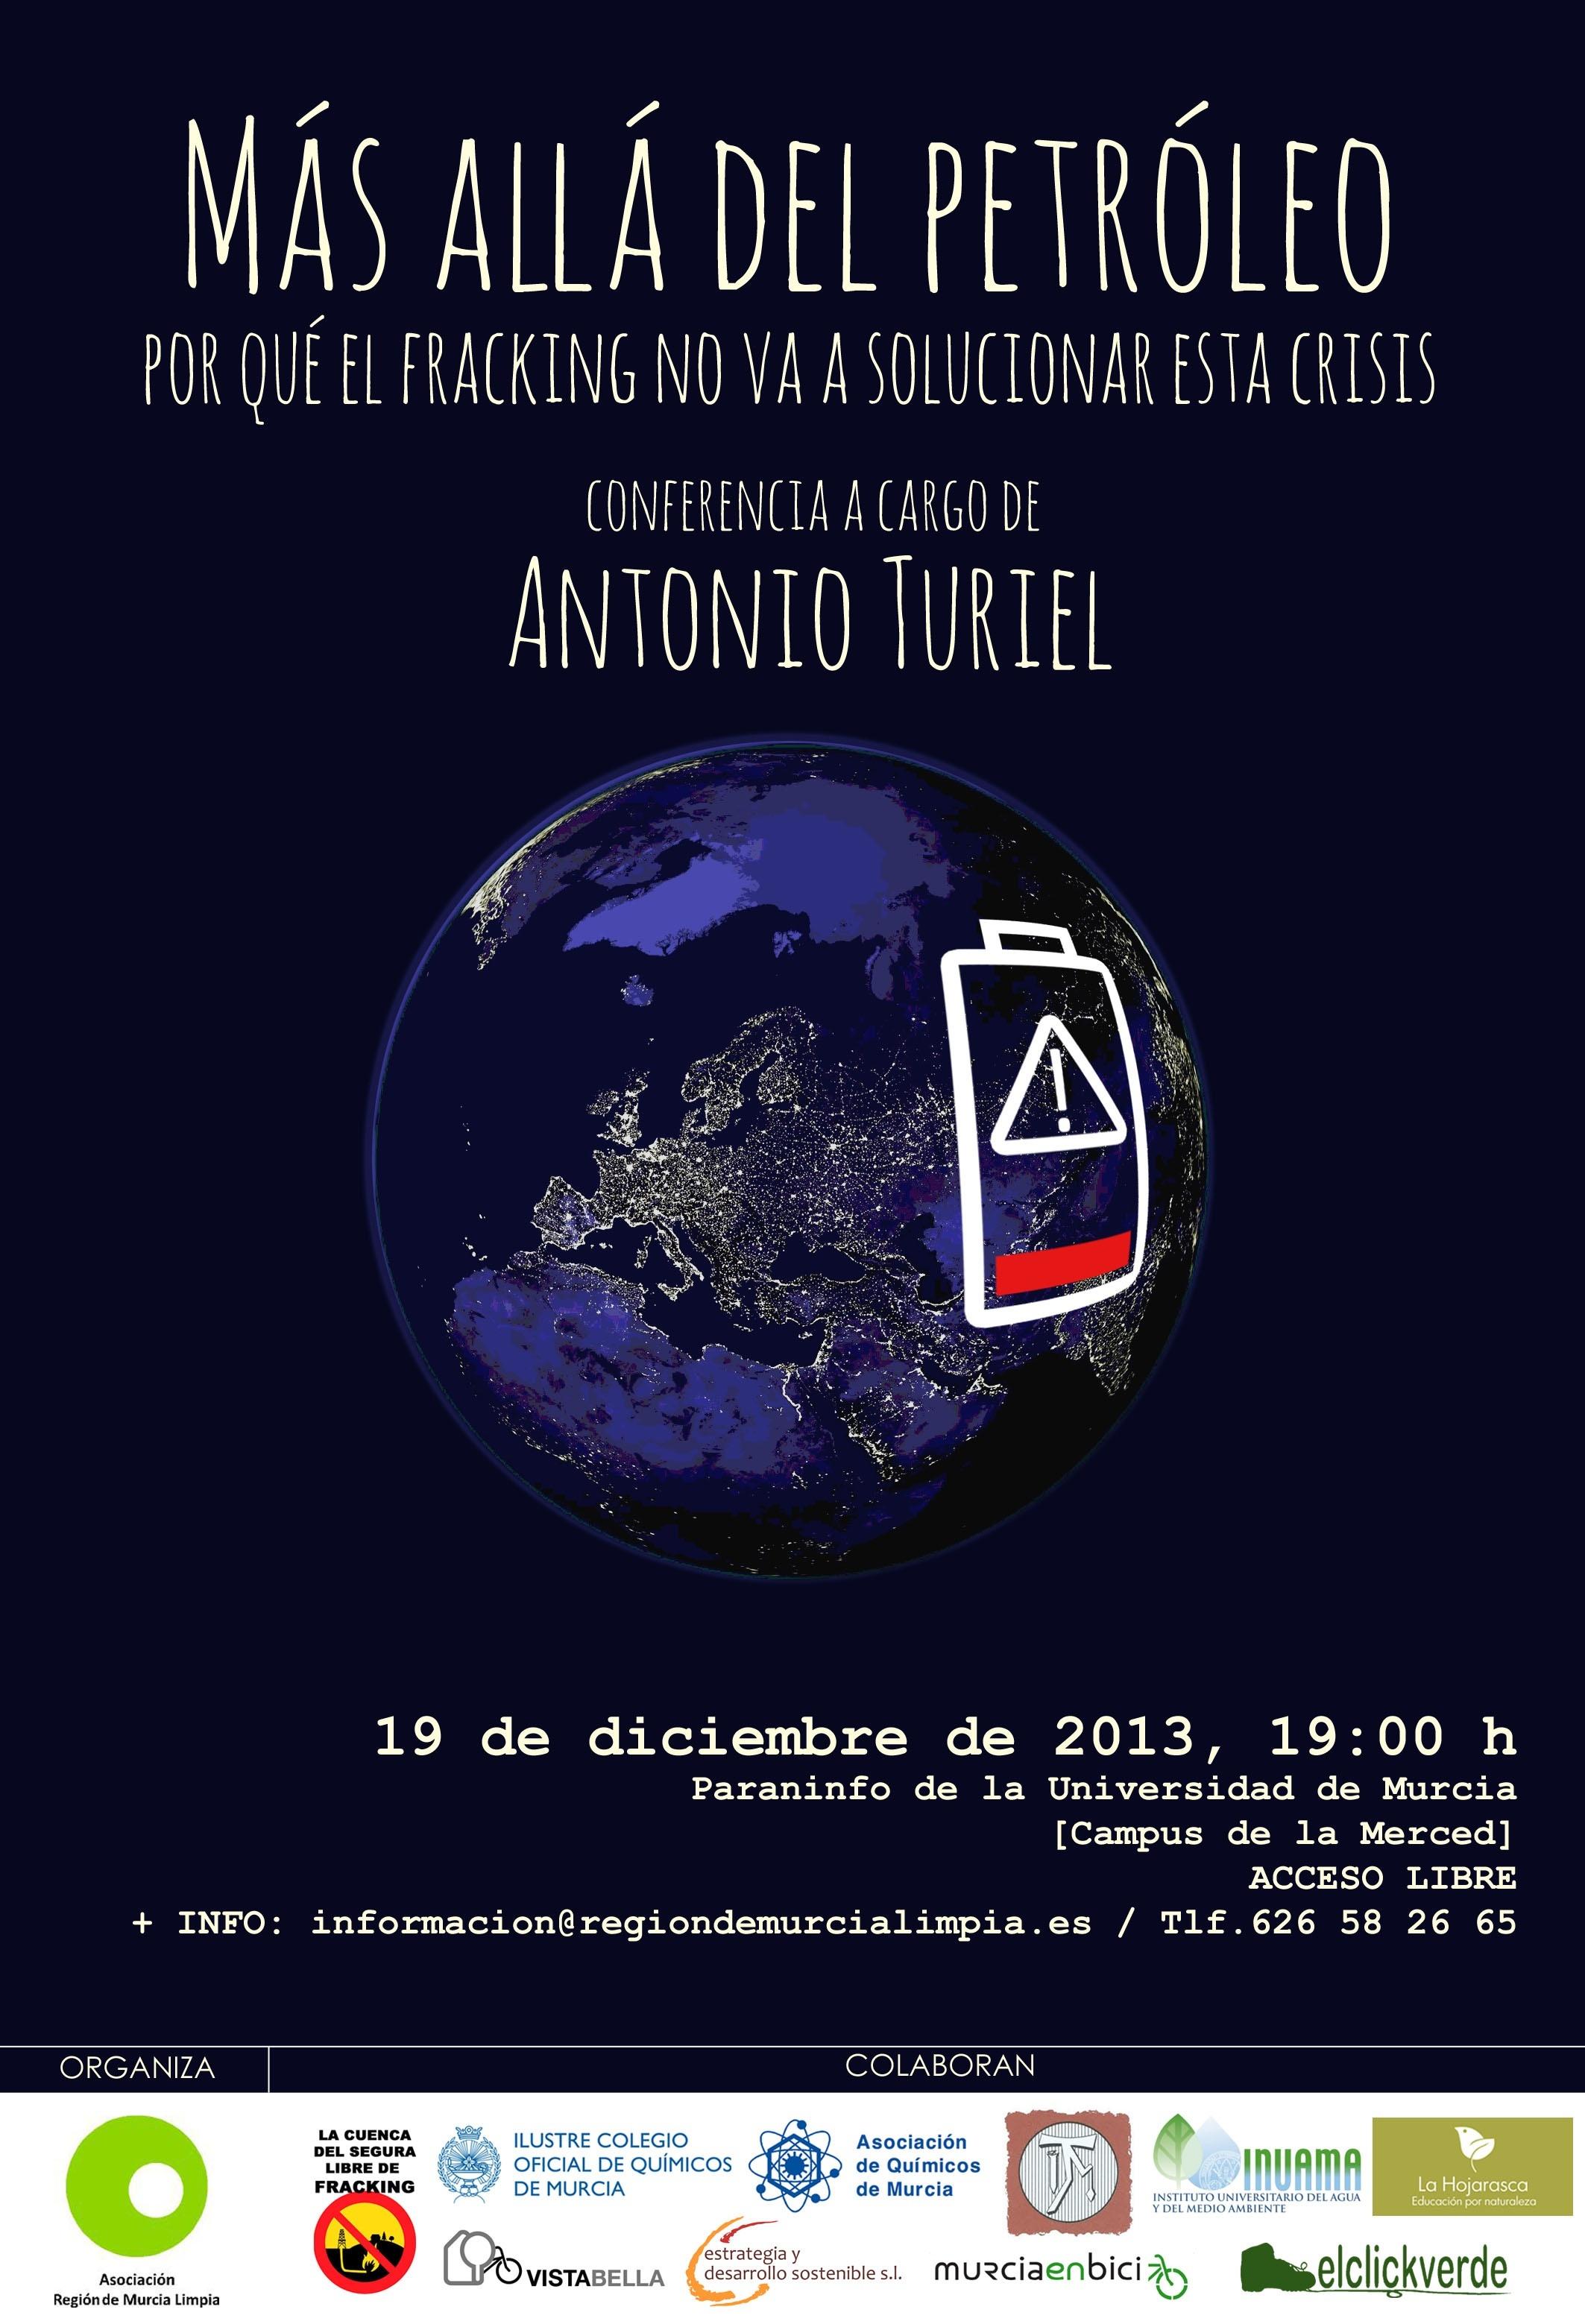 Jue. 19 dic. de 2013. 19:00 h. Paraninfo de la UMU (La Merced).